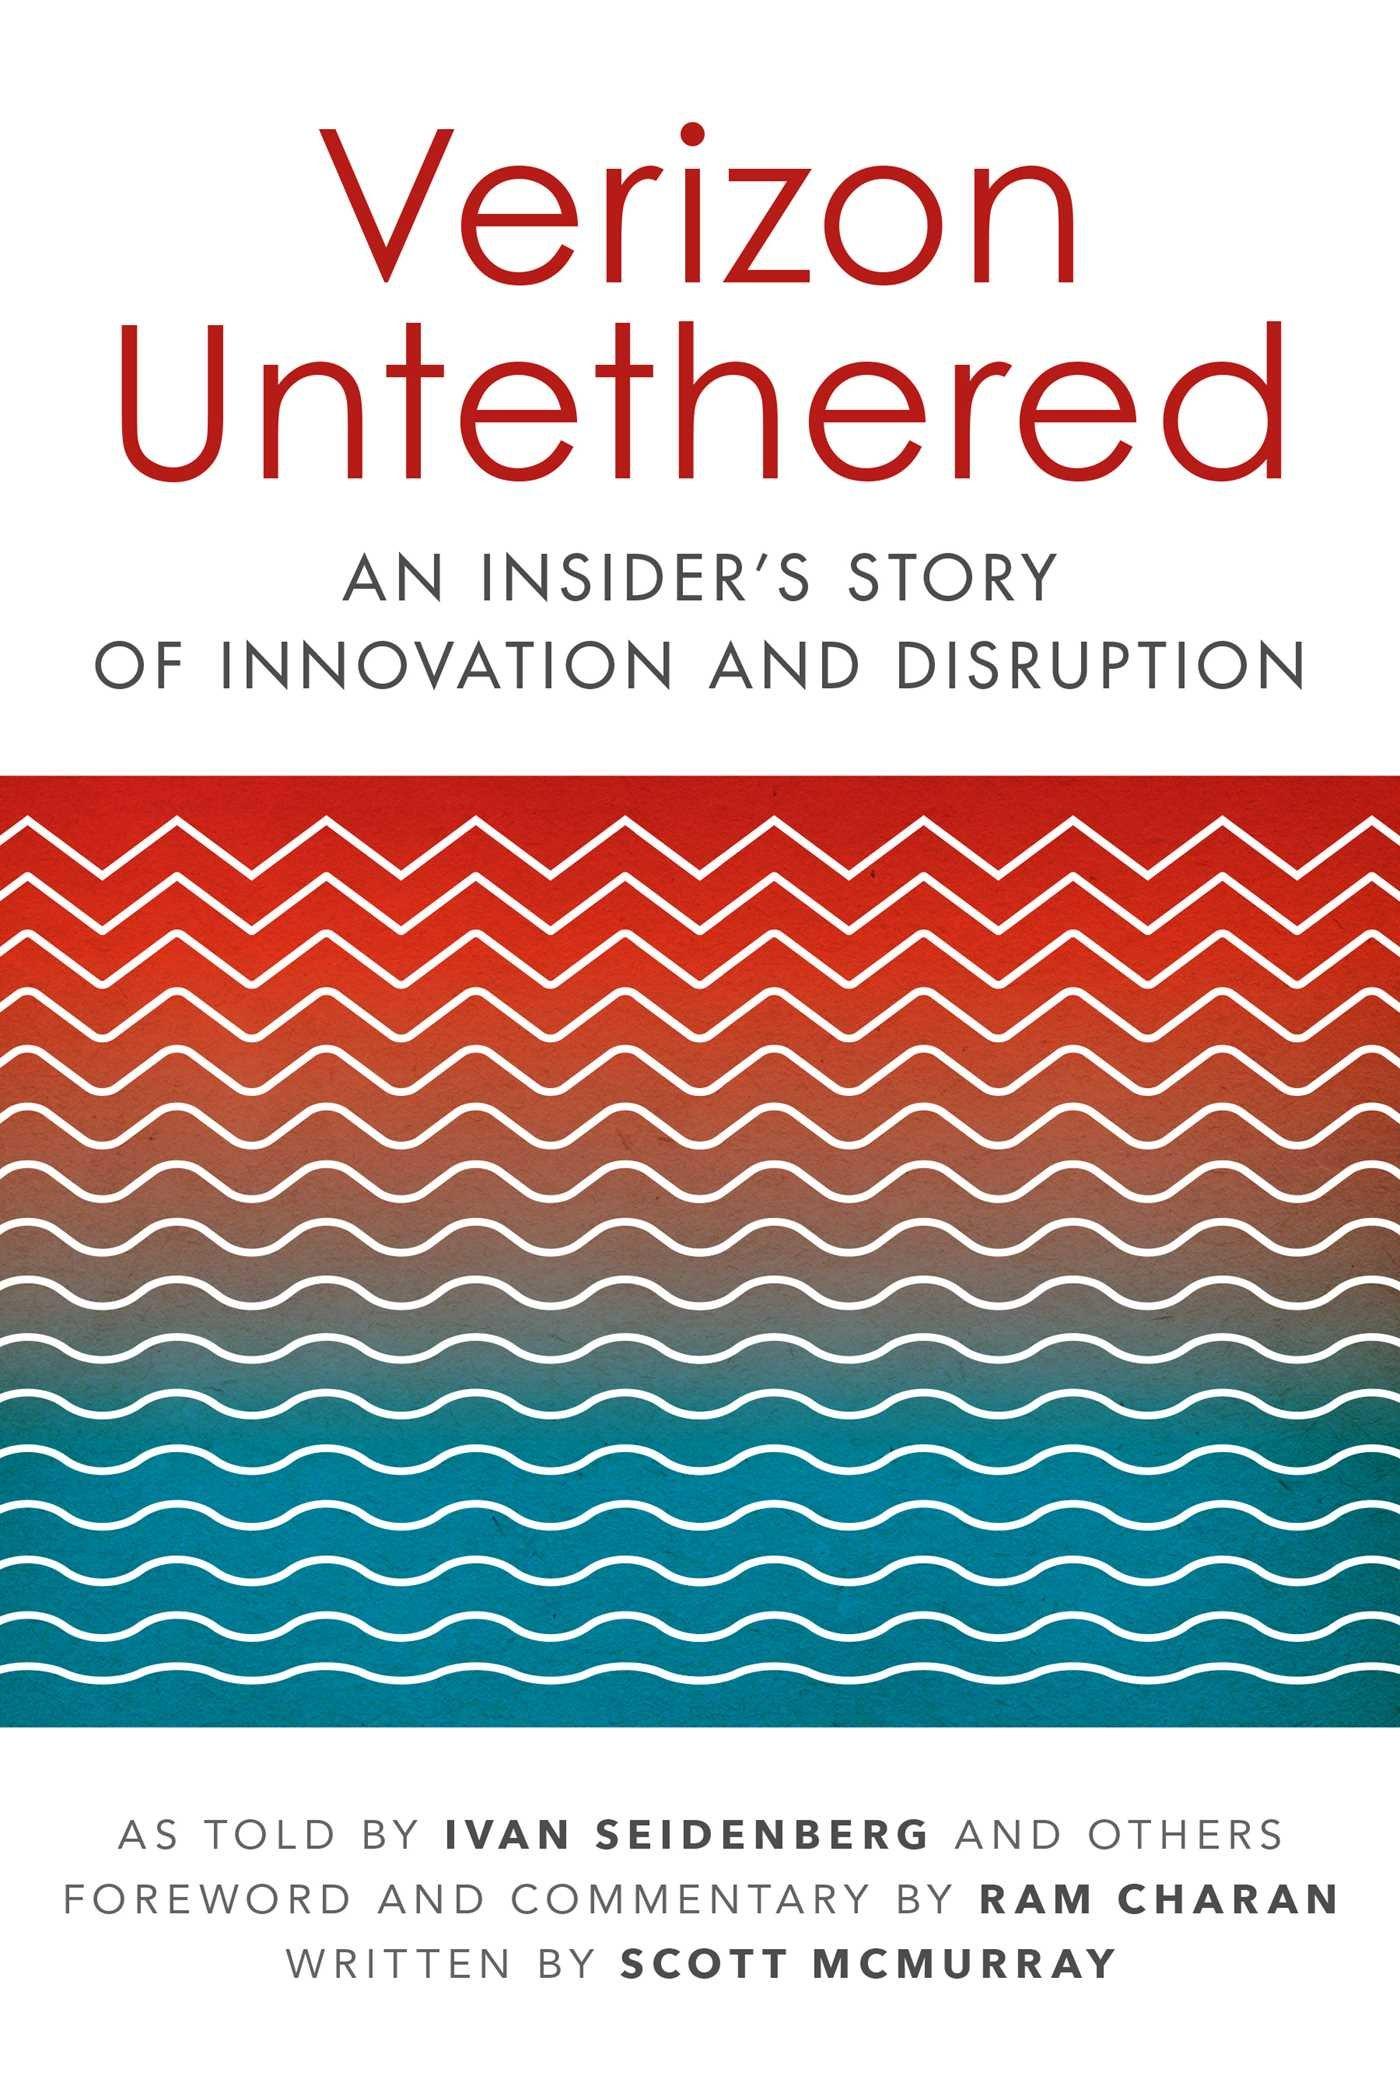 Verizon Untethered Insiders Innovation Disruption product image